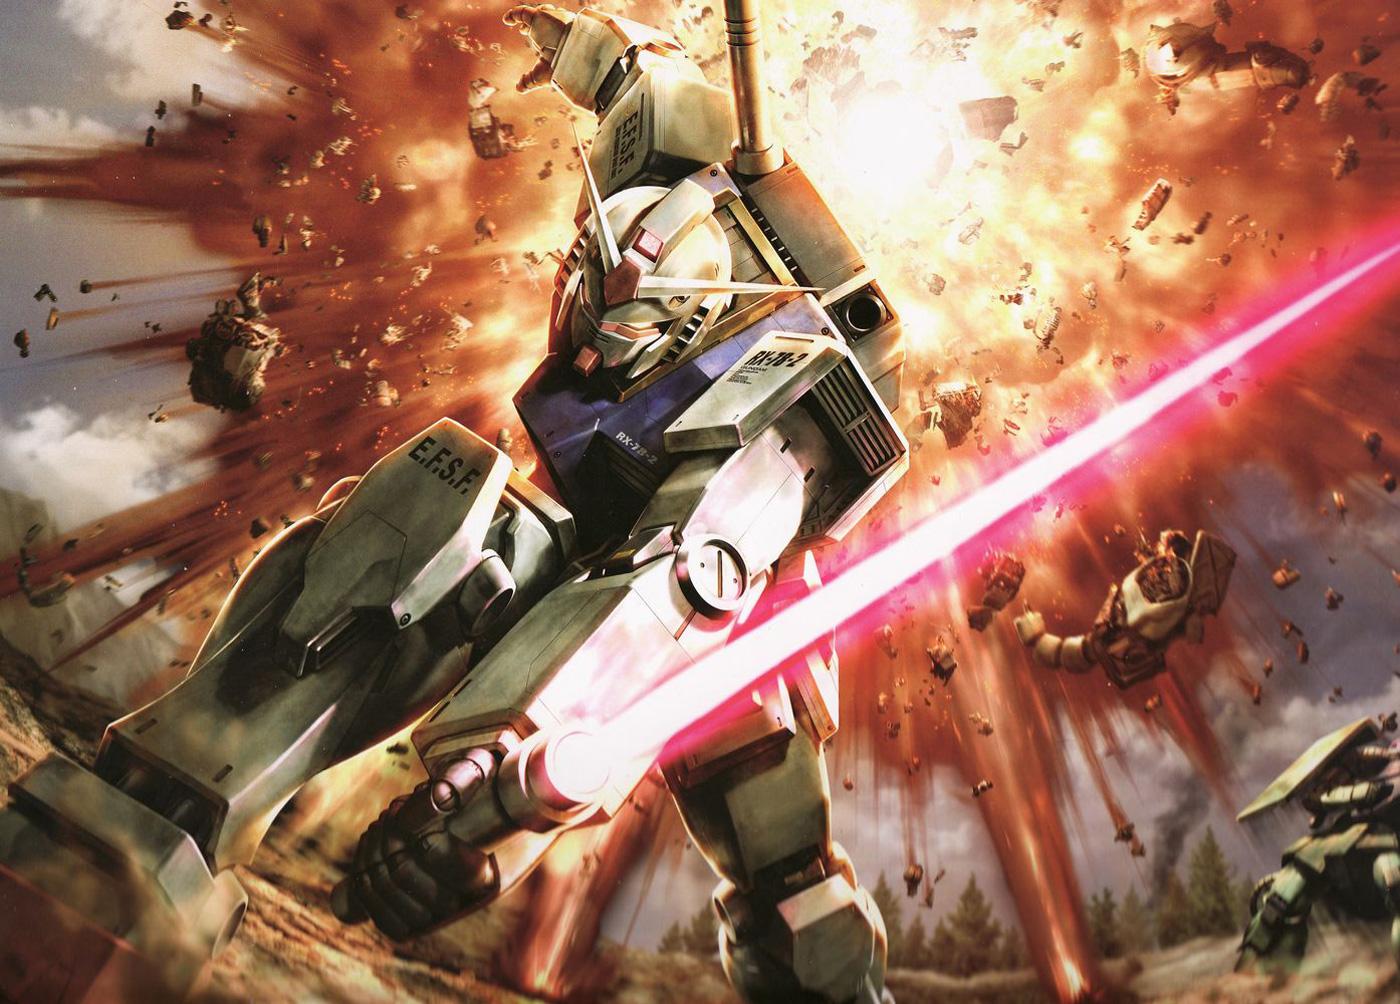 35 anni e non sentirli: Gundam in mostra al Mu.Fant di Torino